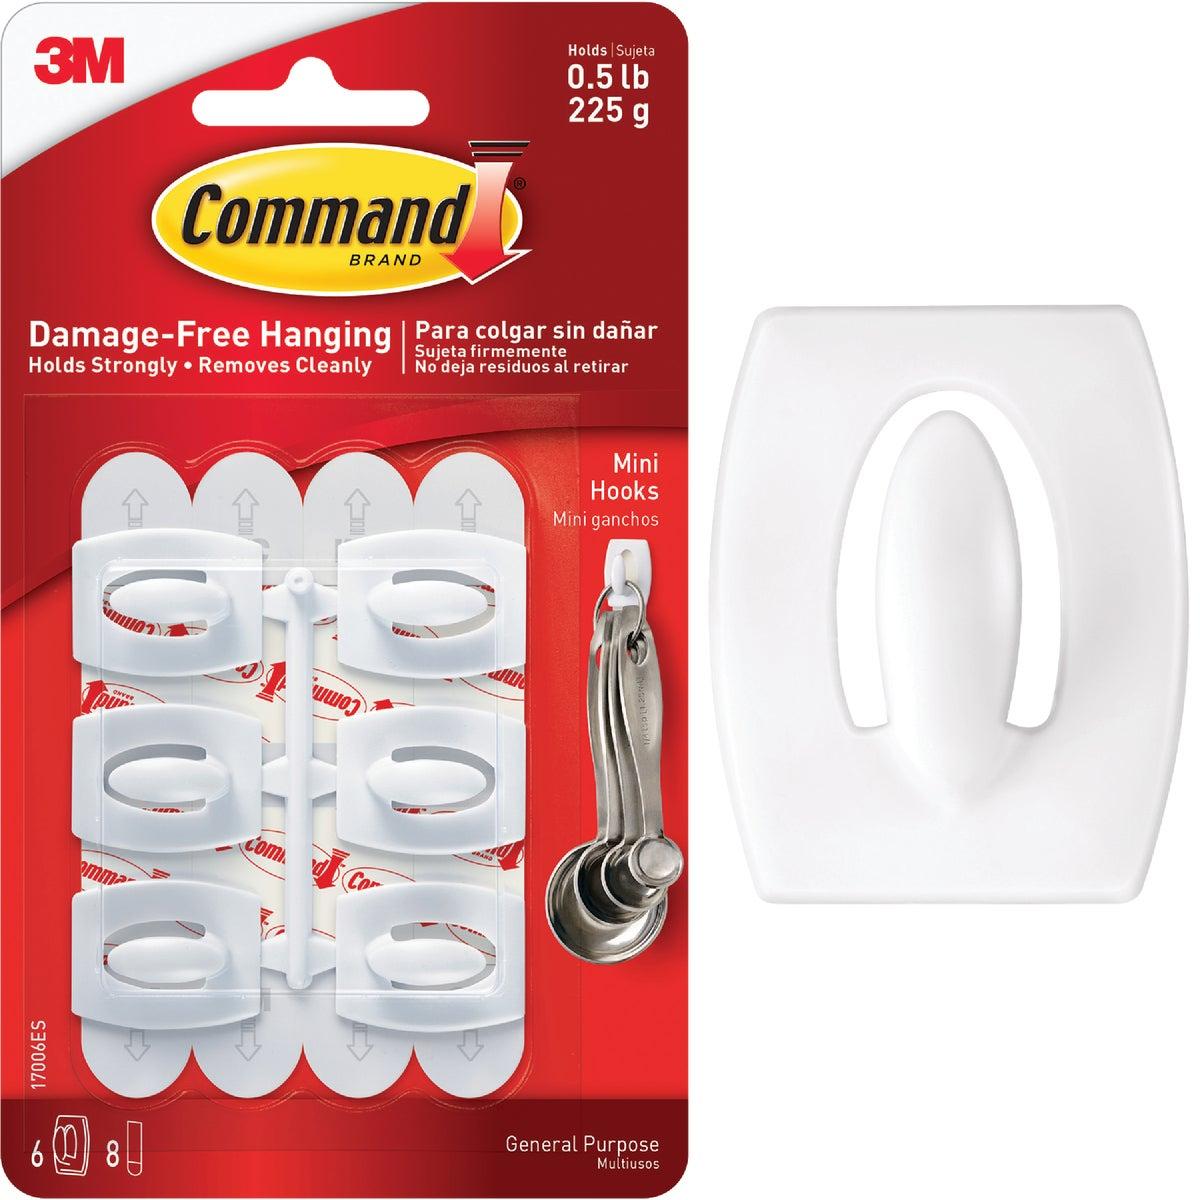 3M Command White Mini Adhesive Hook (6-Pack)